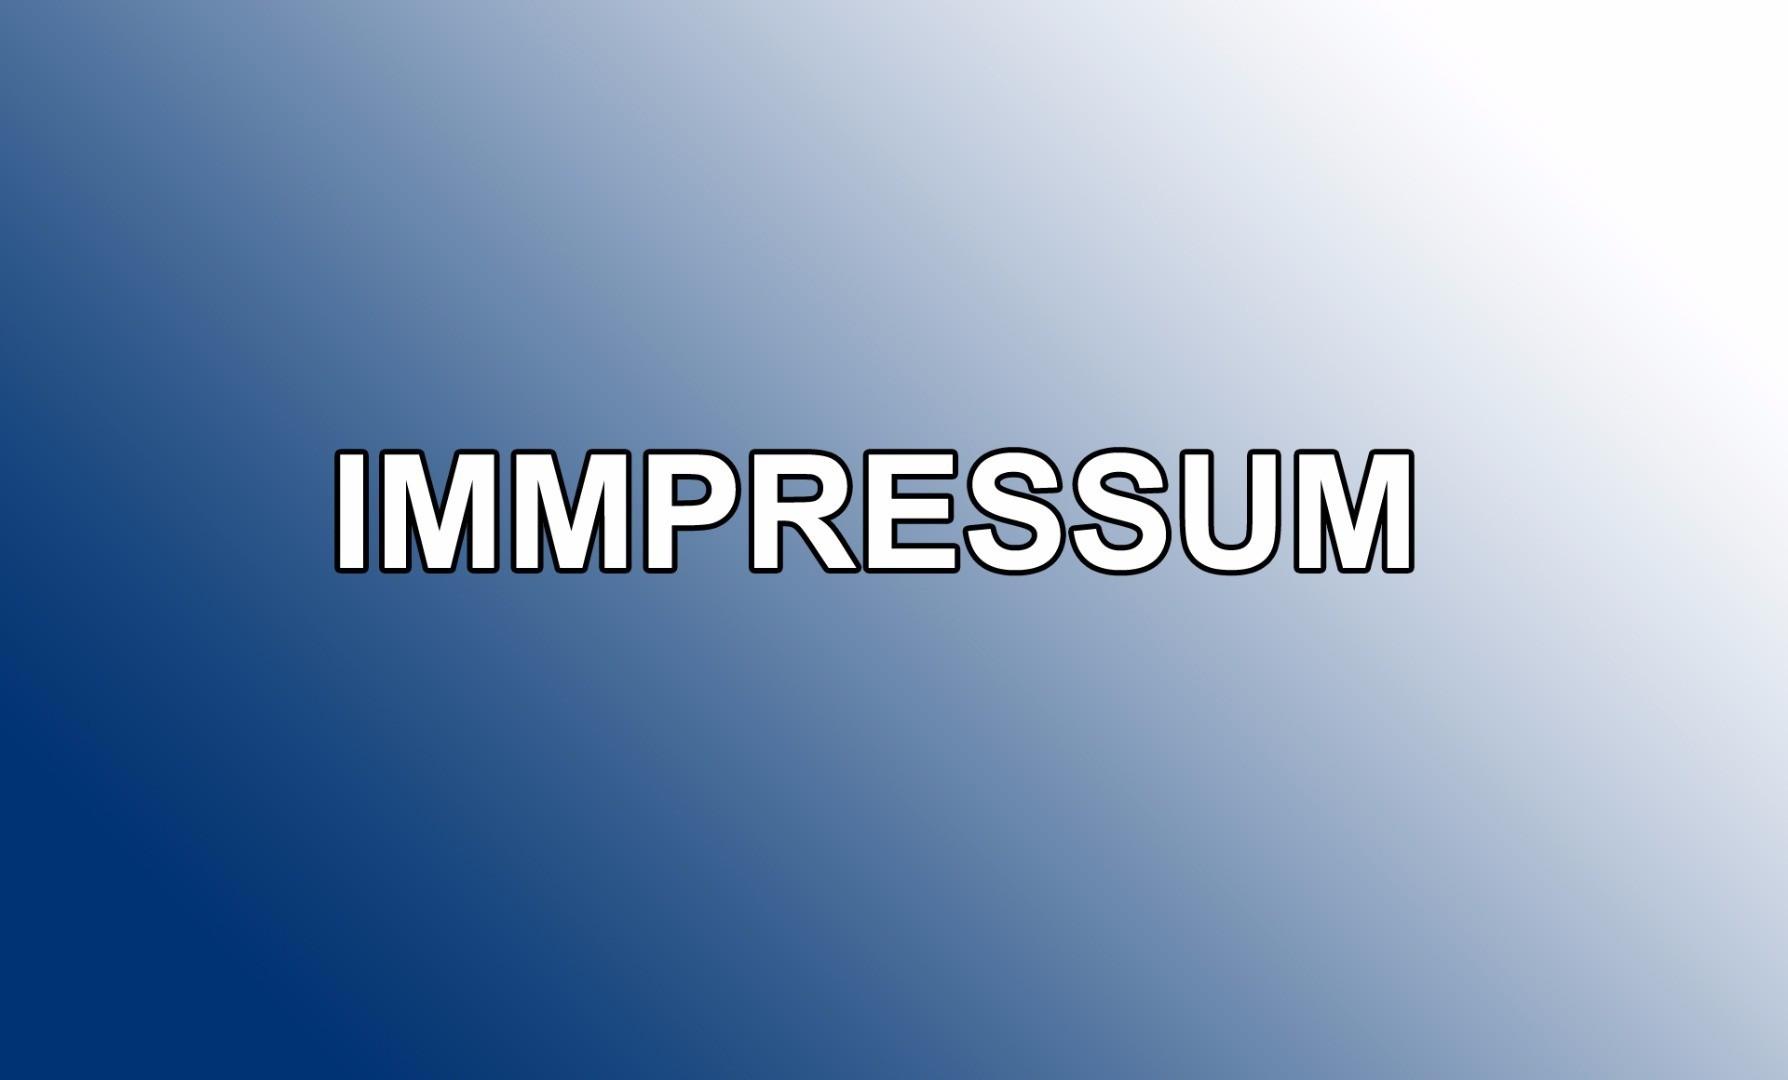 IMMPRESSUM2.jpg